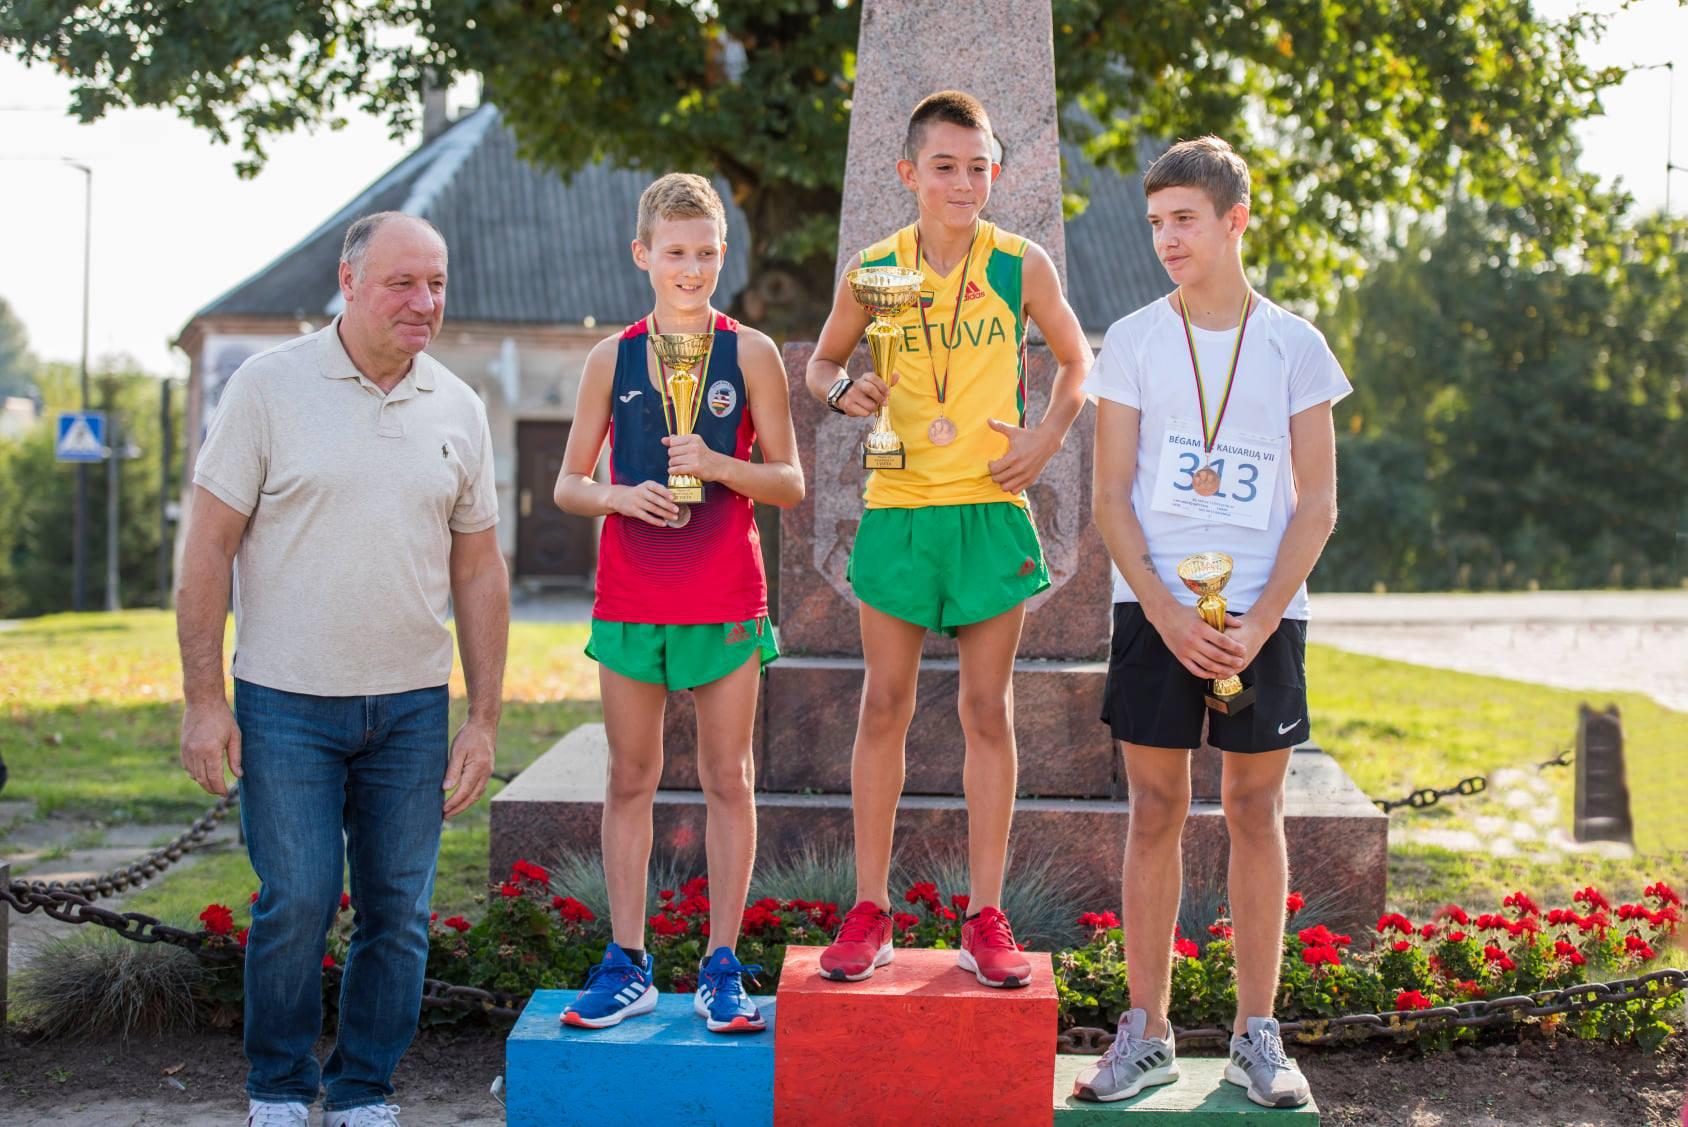 Nojus Minevičius - 1 vieta, Airidas Simanavičius - 2 vieta, Klaidas Vyšniauskas - 3 vieta